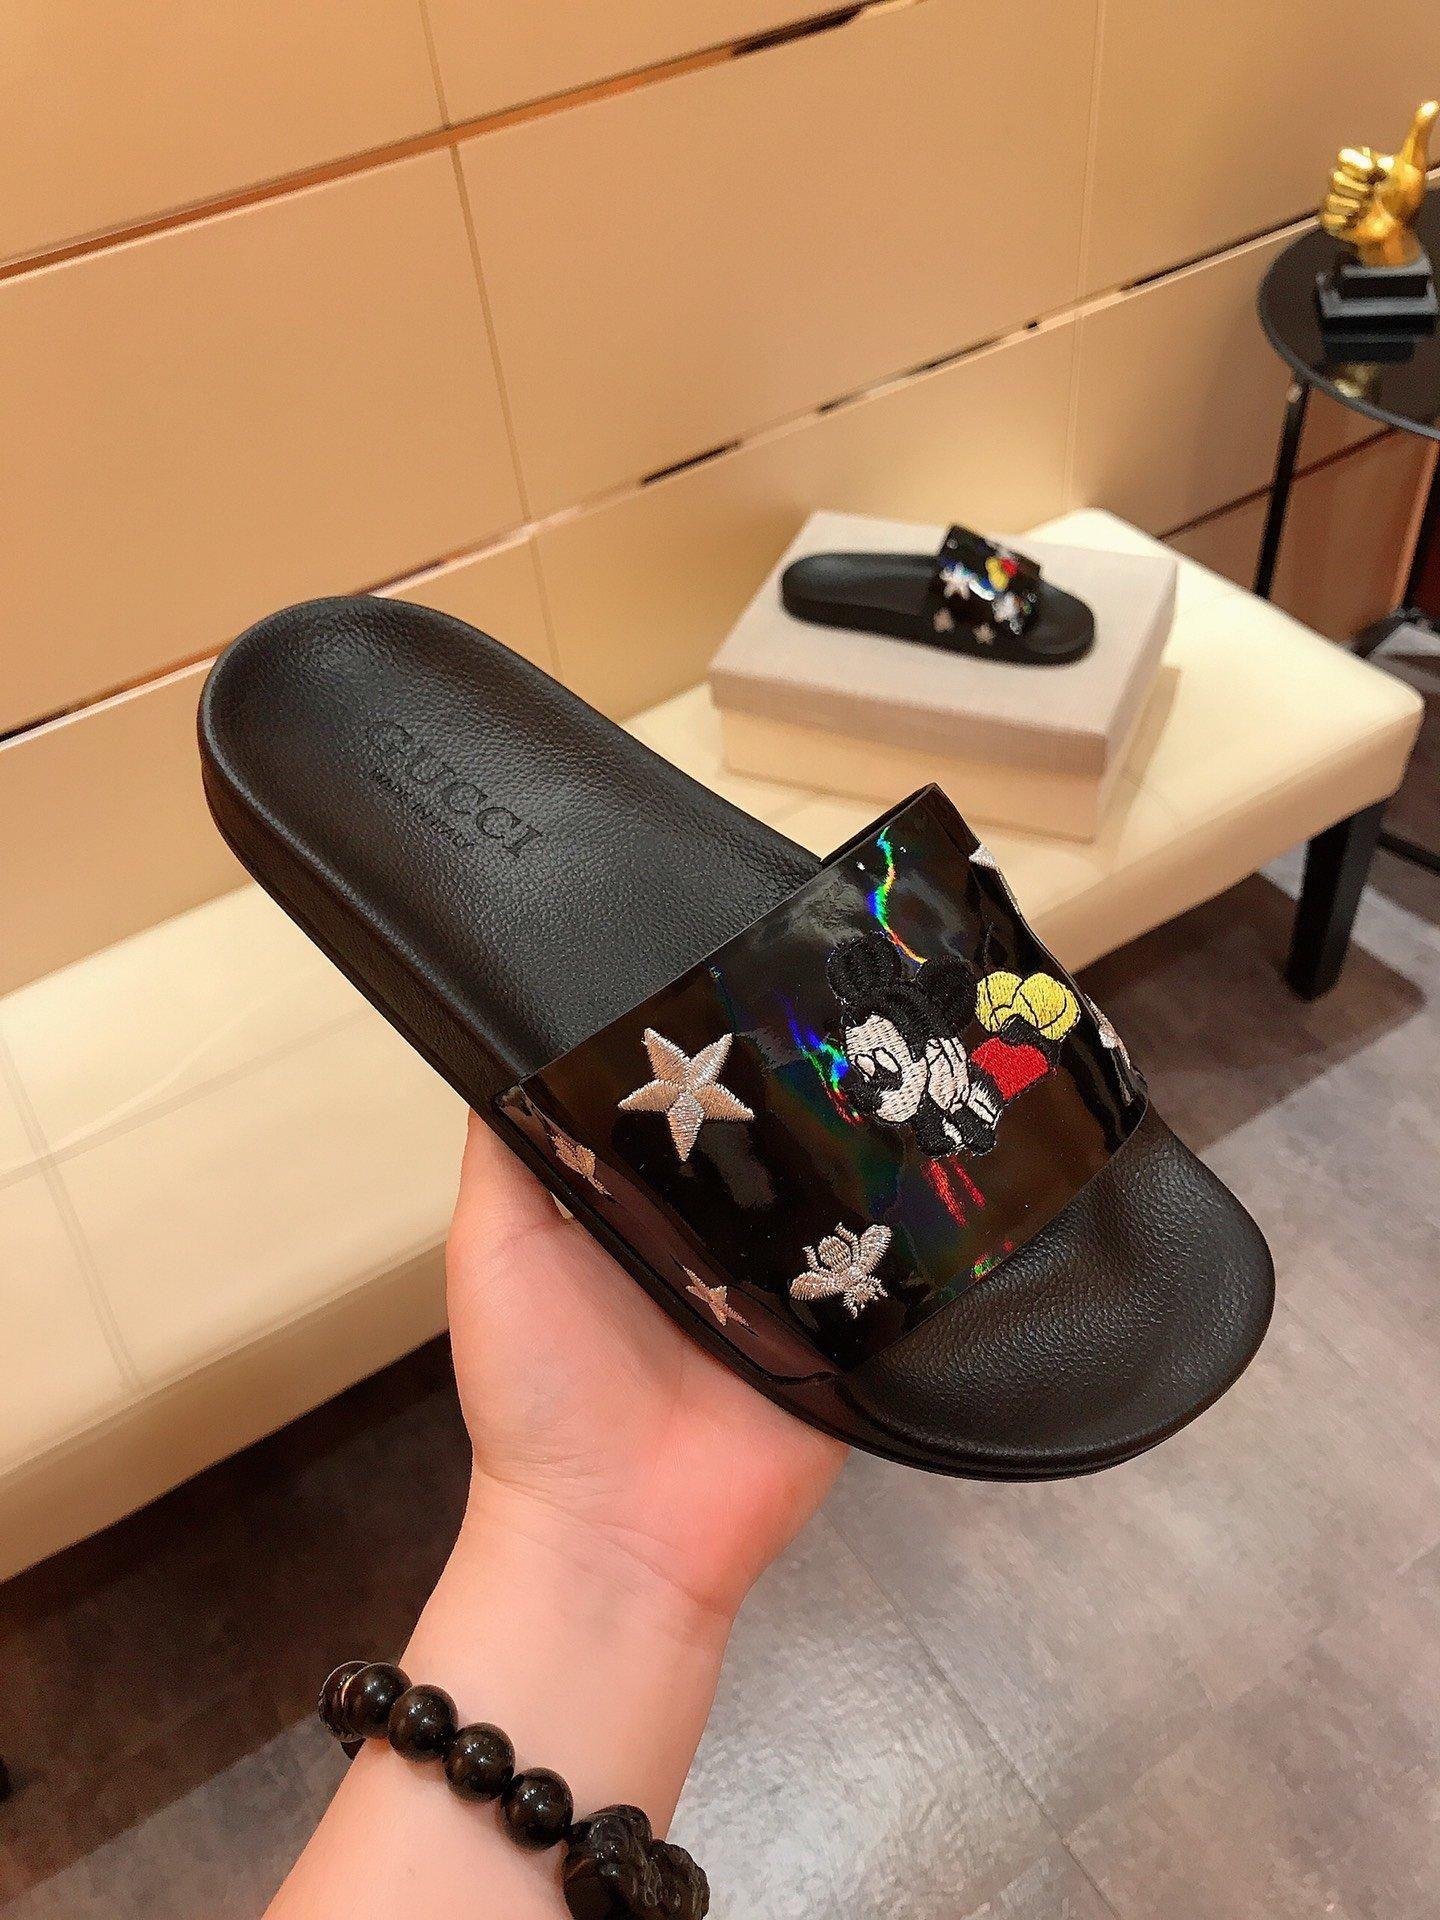 New Fashion Men Women Designer Slides Shoes Summer Wide Flat Slippery Sandals Slipper Flip Flop Rice Mouse cartoon print Ace Bee 38-44 H28